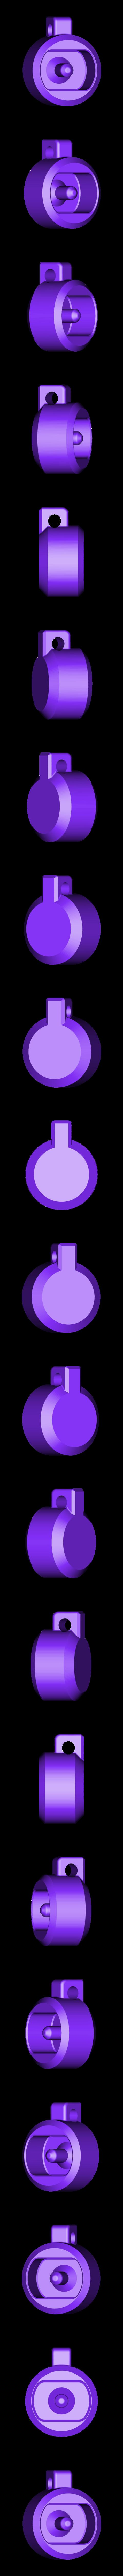 2L_bottle_water_filter_PART_D.stl Download free STL file Camping/Survival Water Filter • 3D printable model, MuSSy